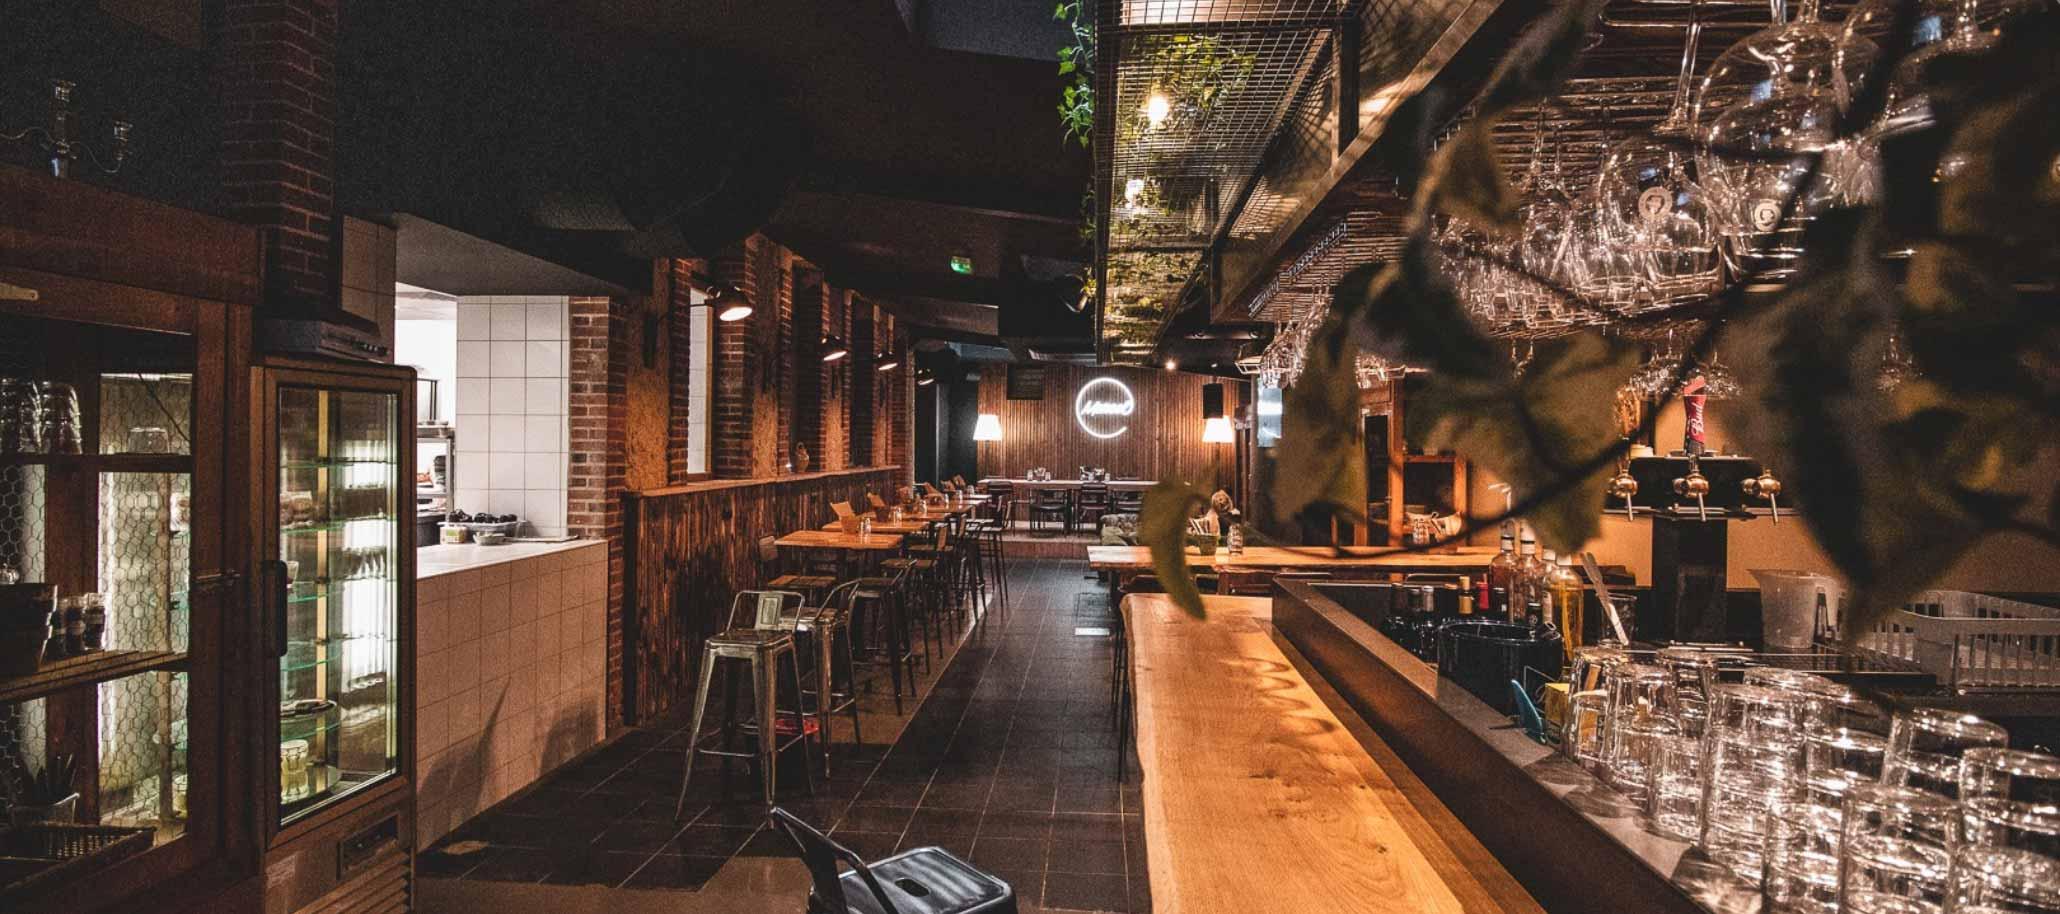 Notre restaurant et bar Chez Marcel Tarbes.